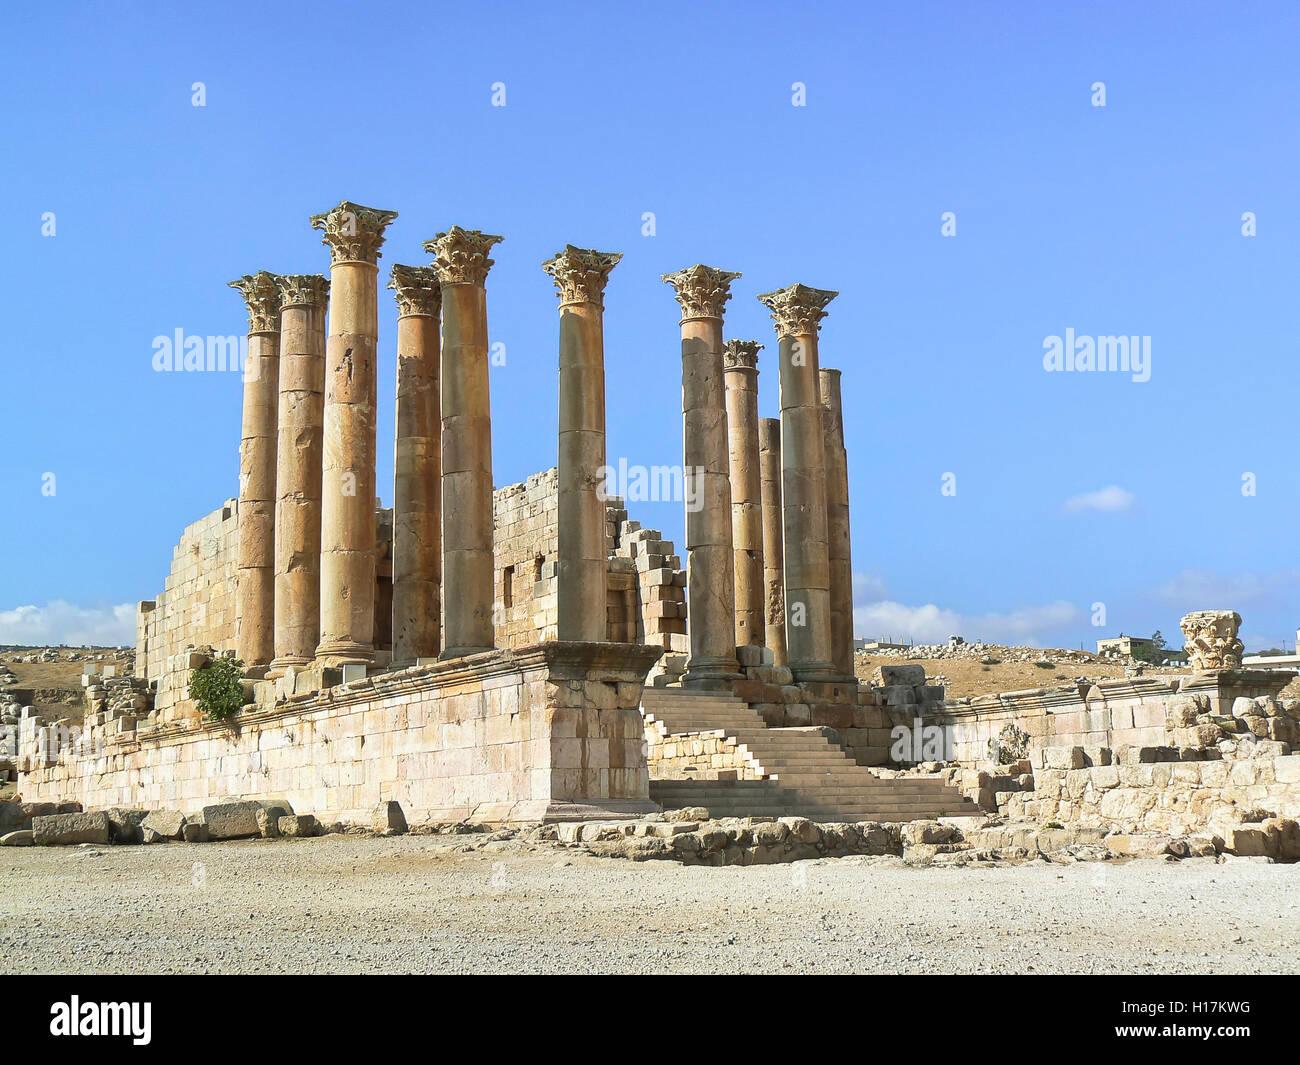 Cella of the Artemis temple, Roman temples at Jerash, Jordan - Stock Image